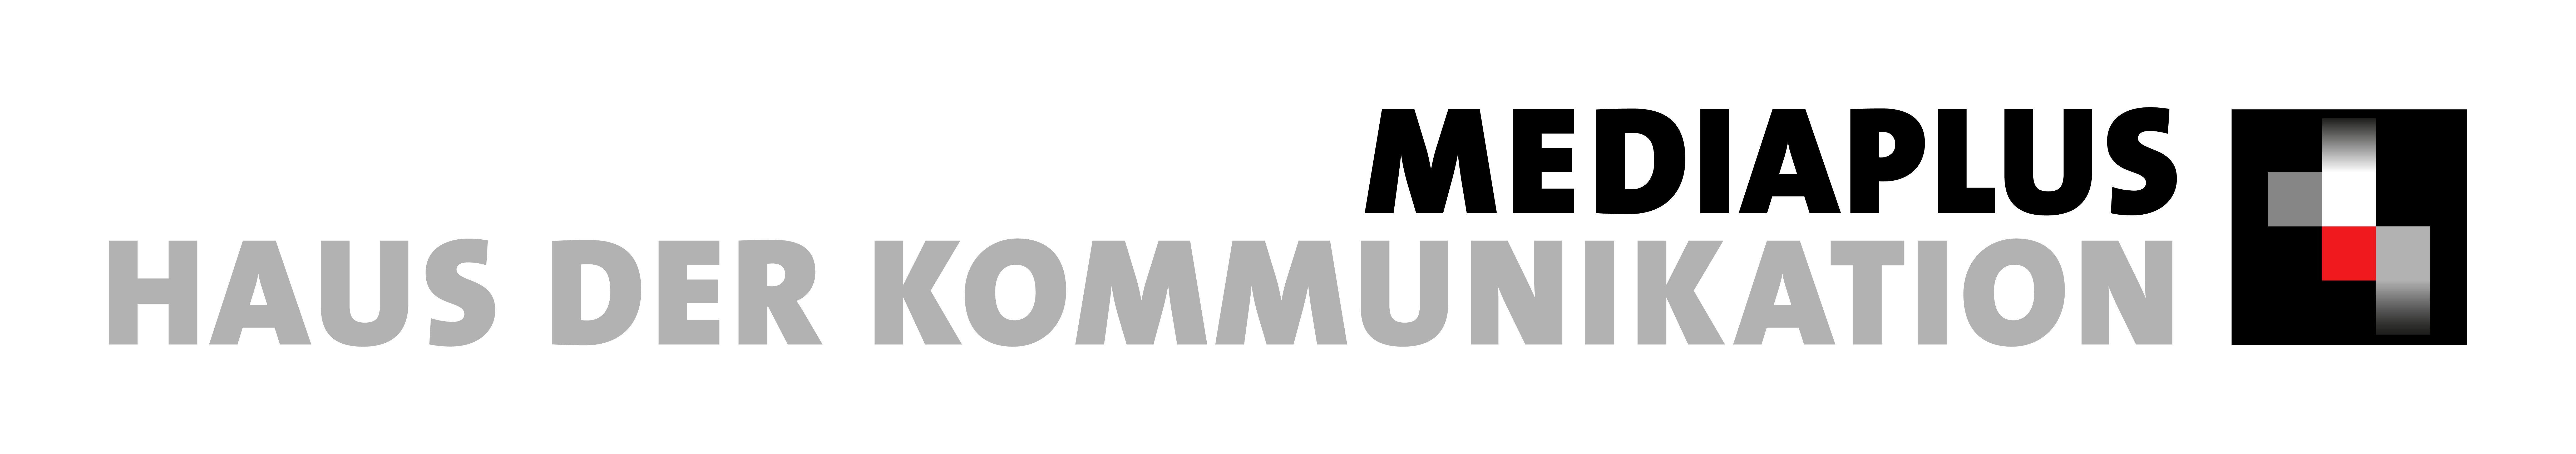 Mediaplus Austria GmbH & Co KG